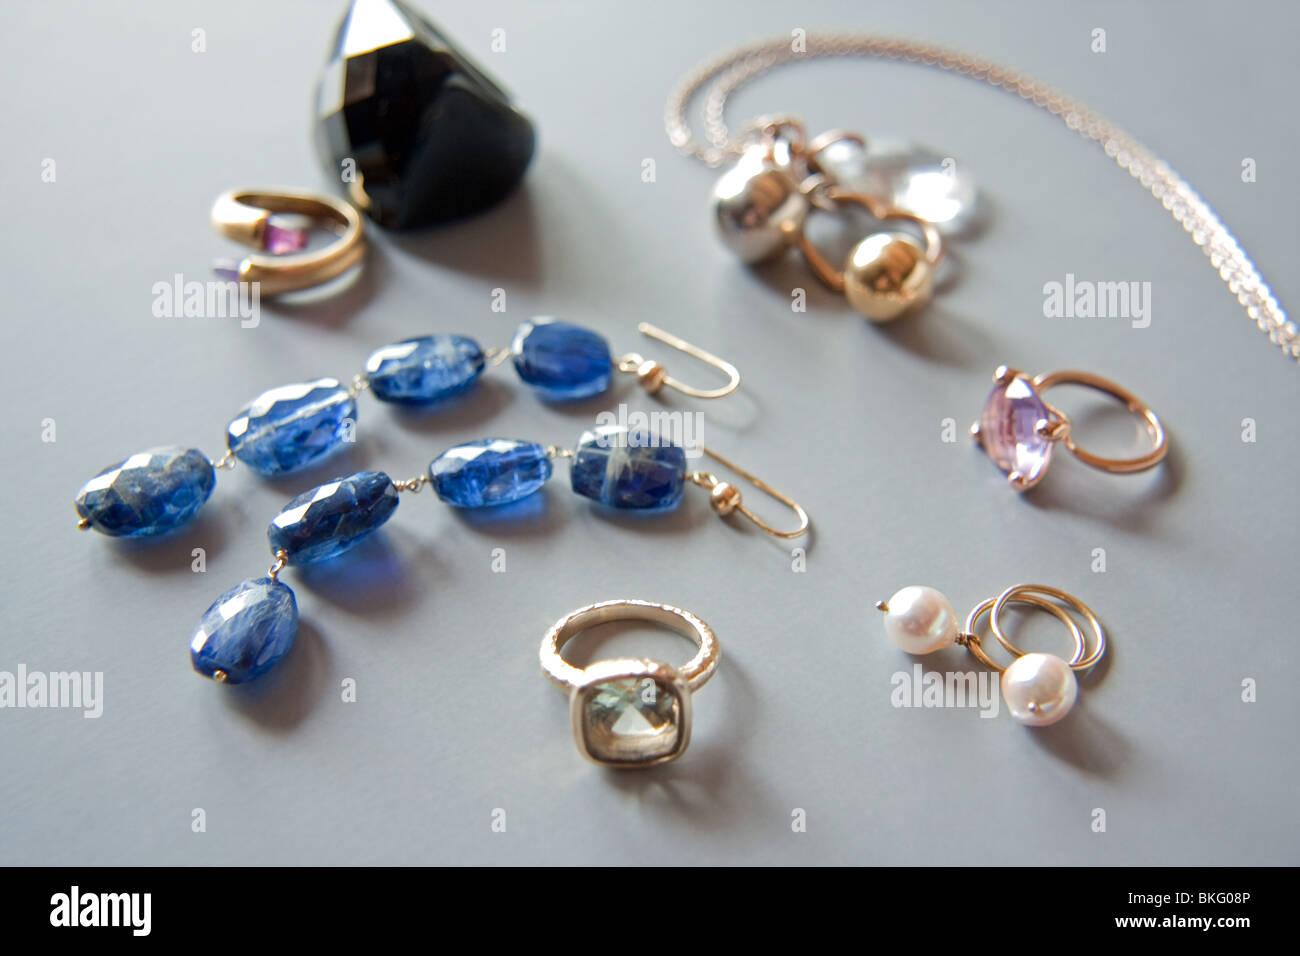 Various jewelry - Stock Image